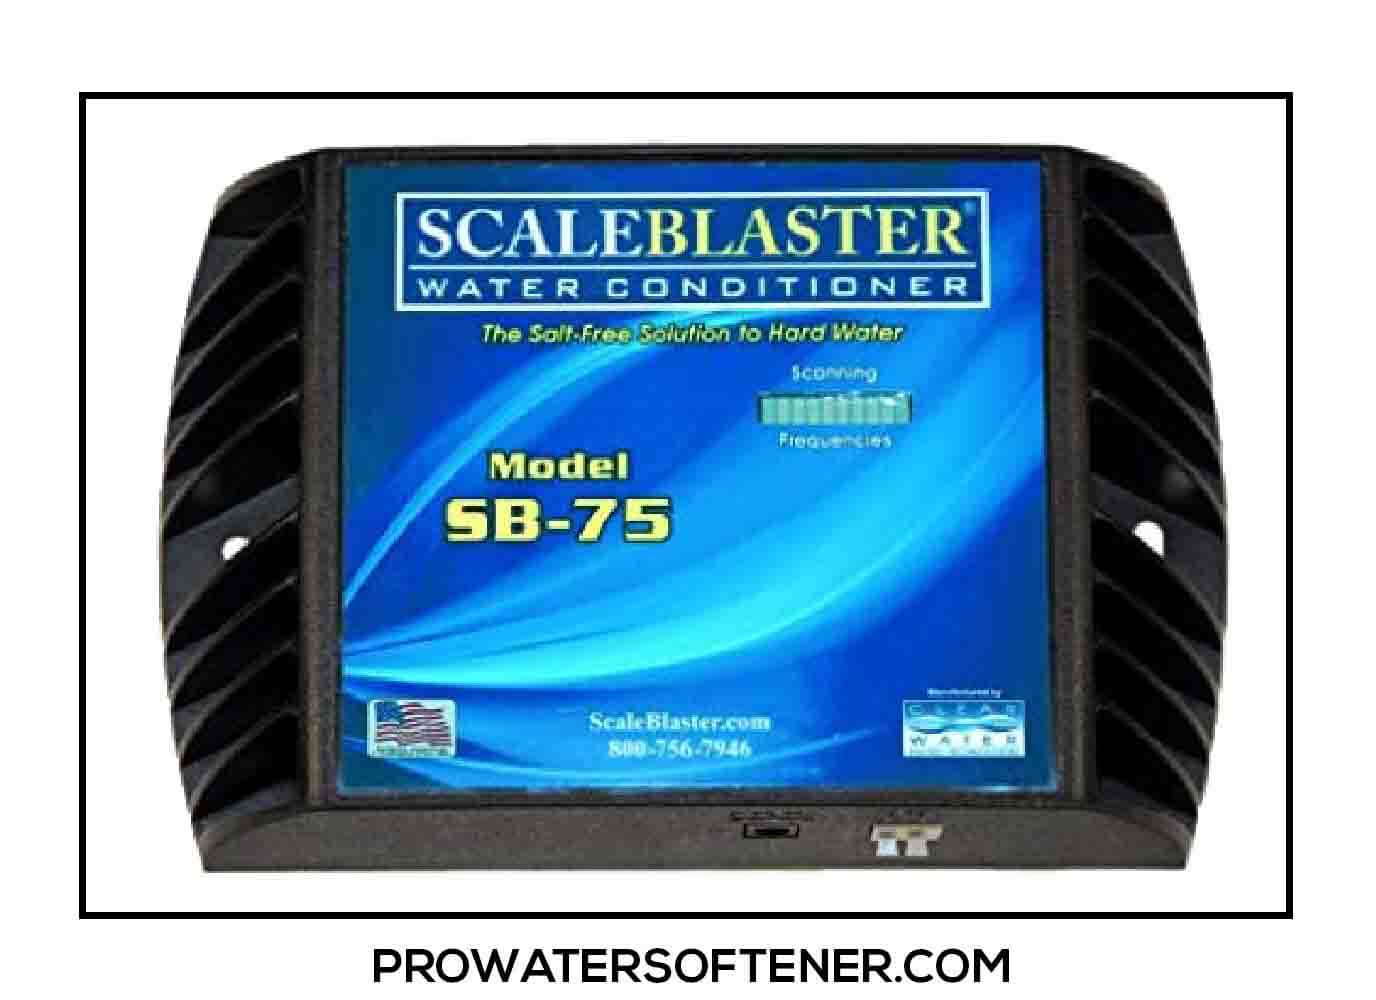 SB-75 ScaleBlaster